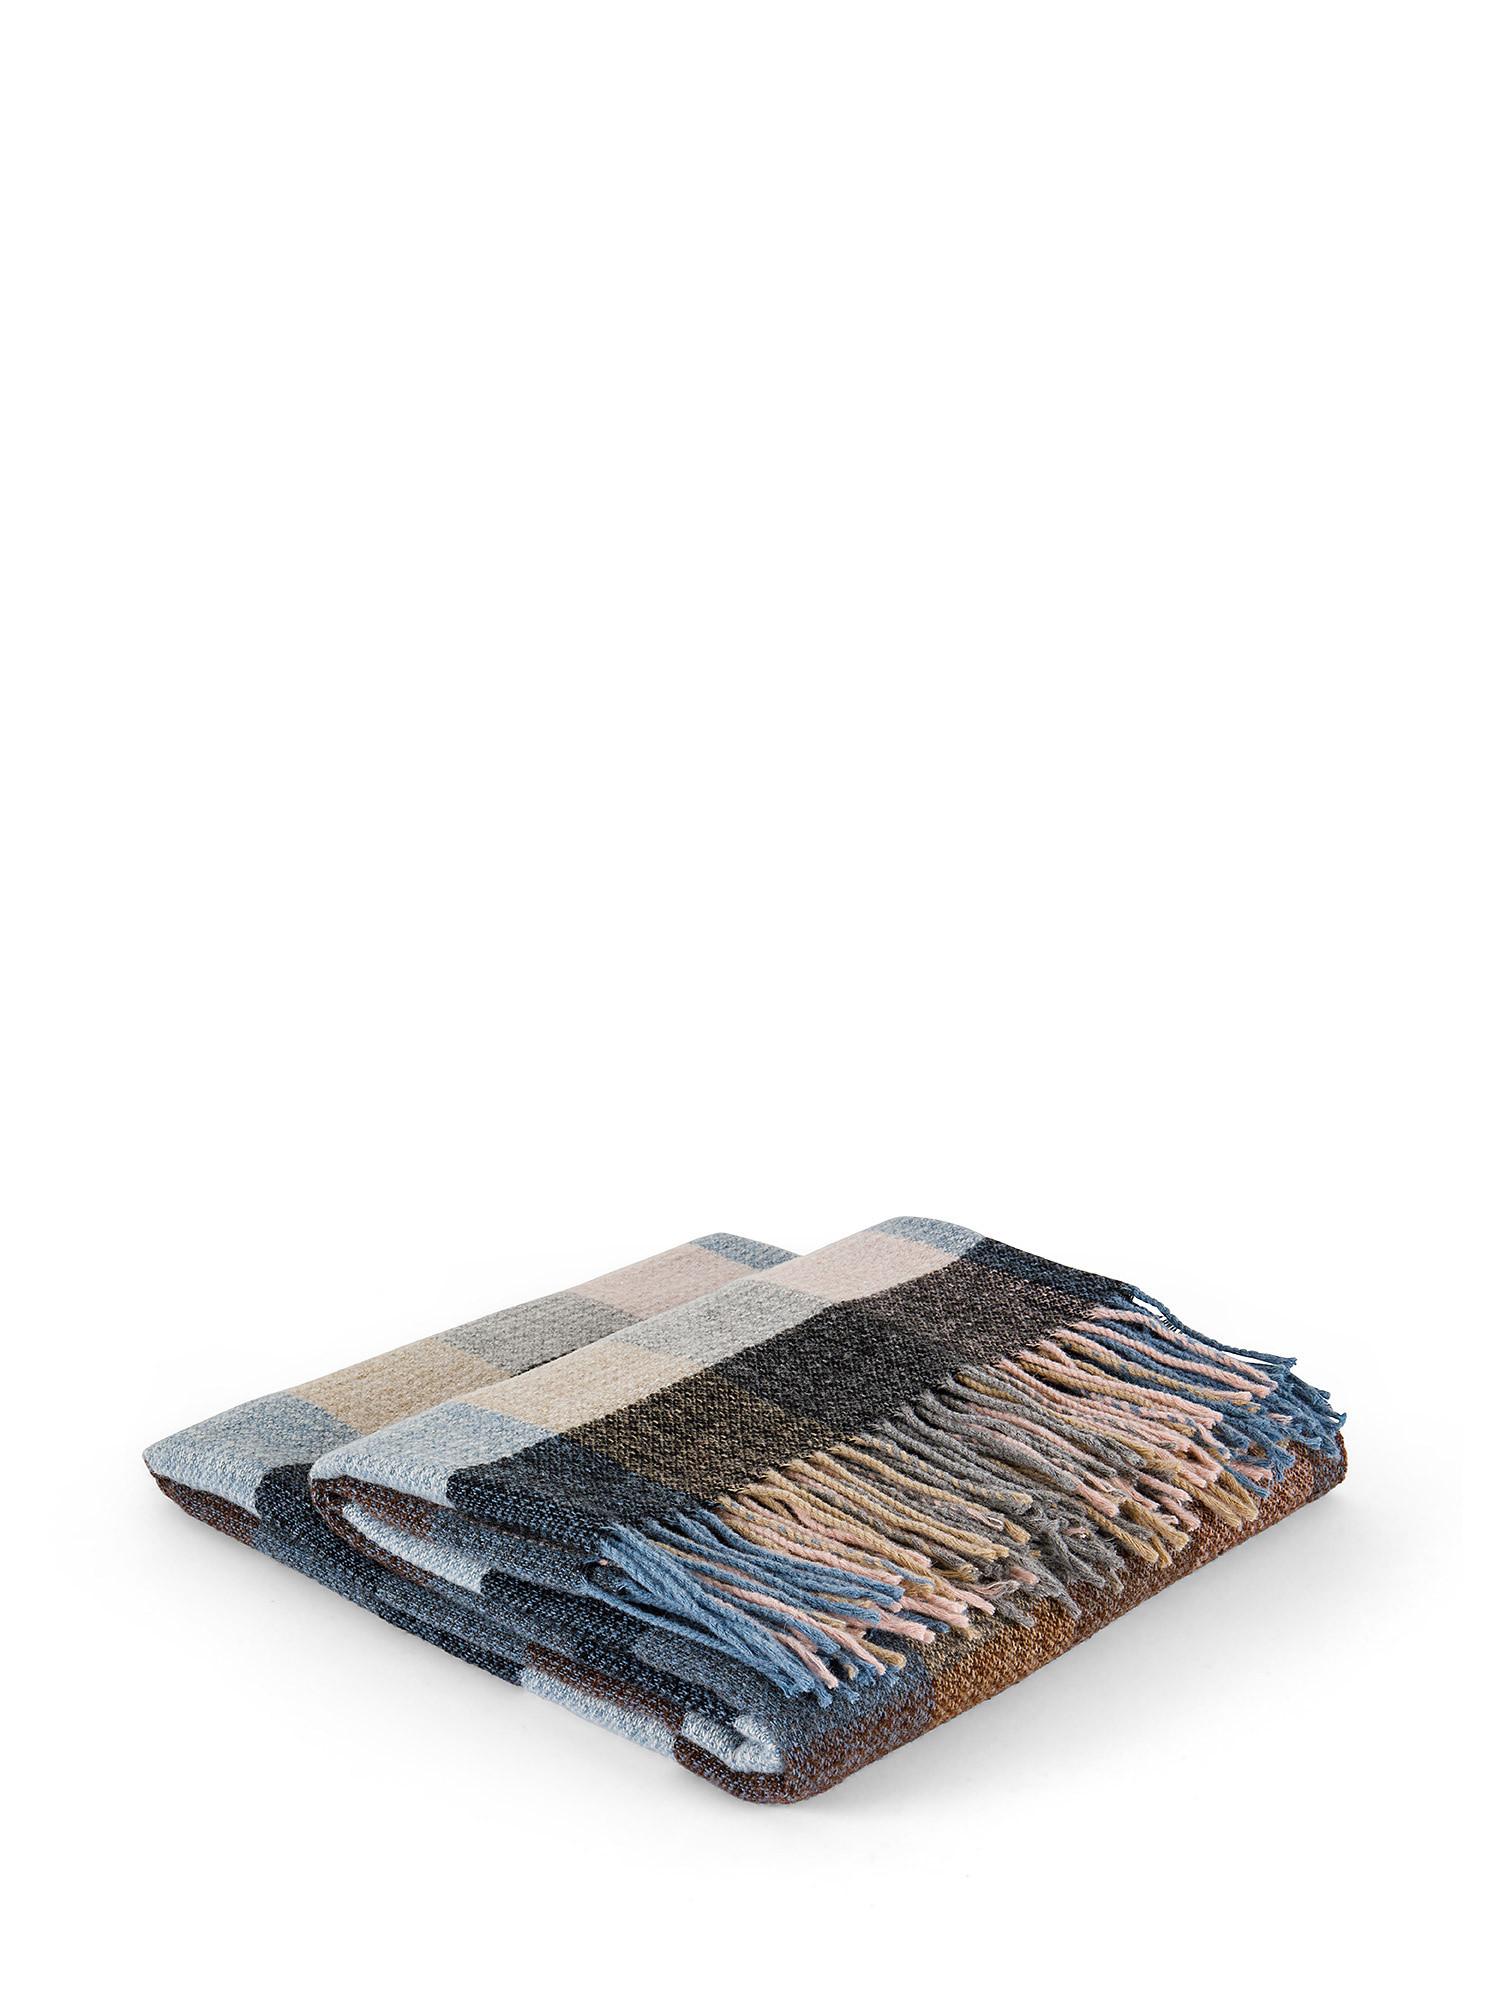 Plaid cotone ecologico a quadri, Multicolor, large image number 0